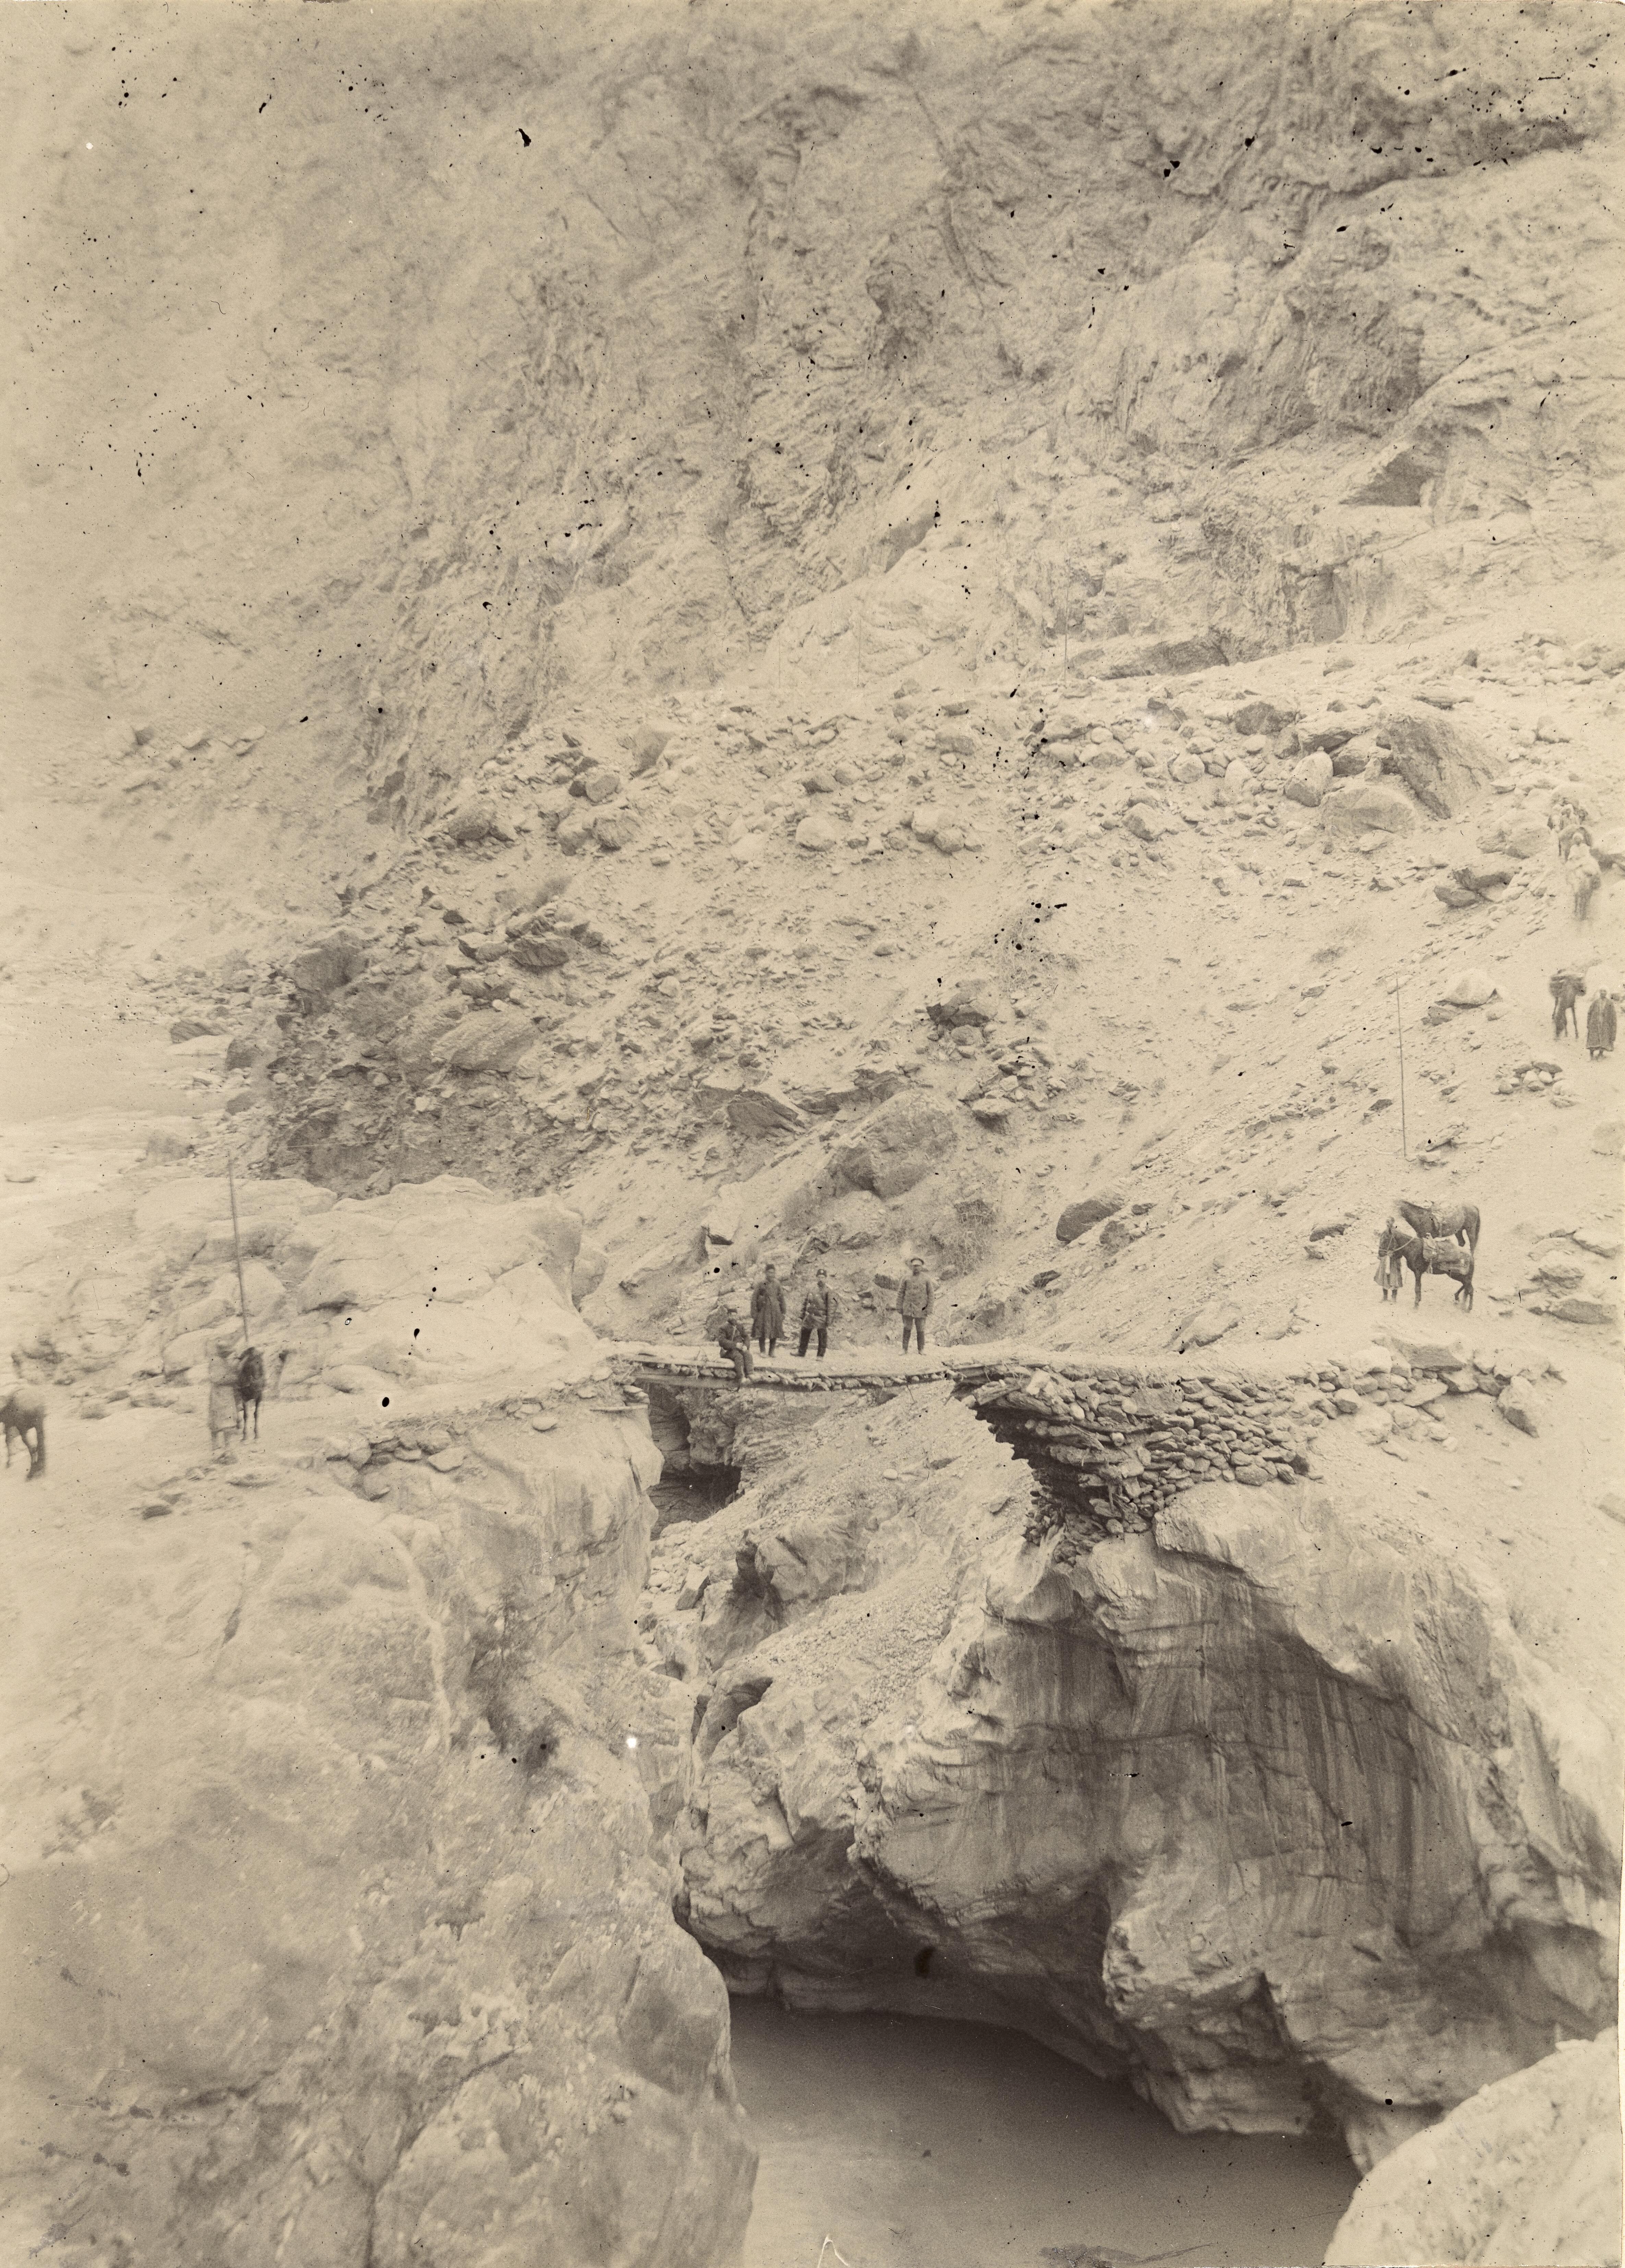 07. Мостик на реке Фан-Дарг